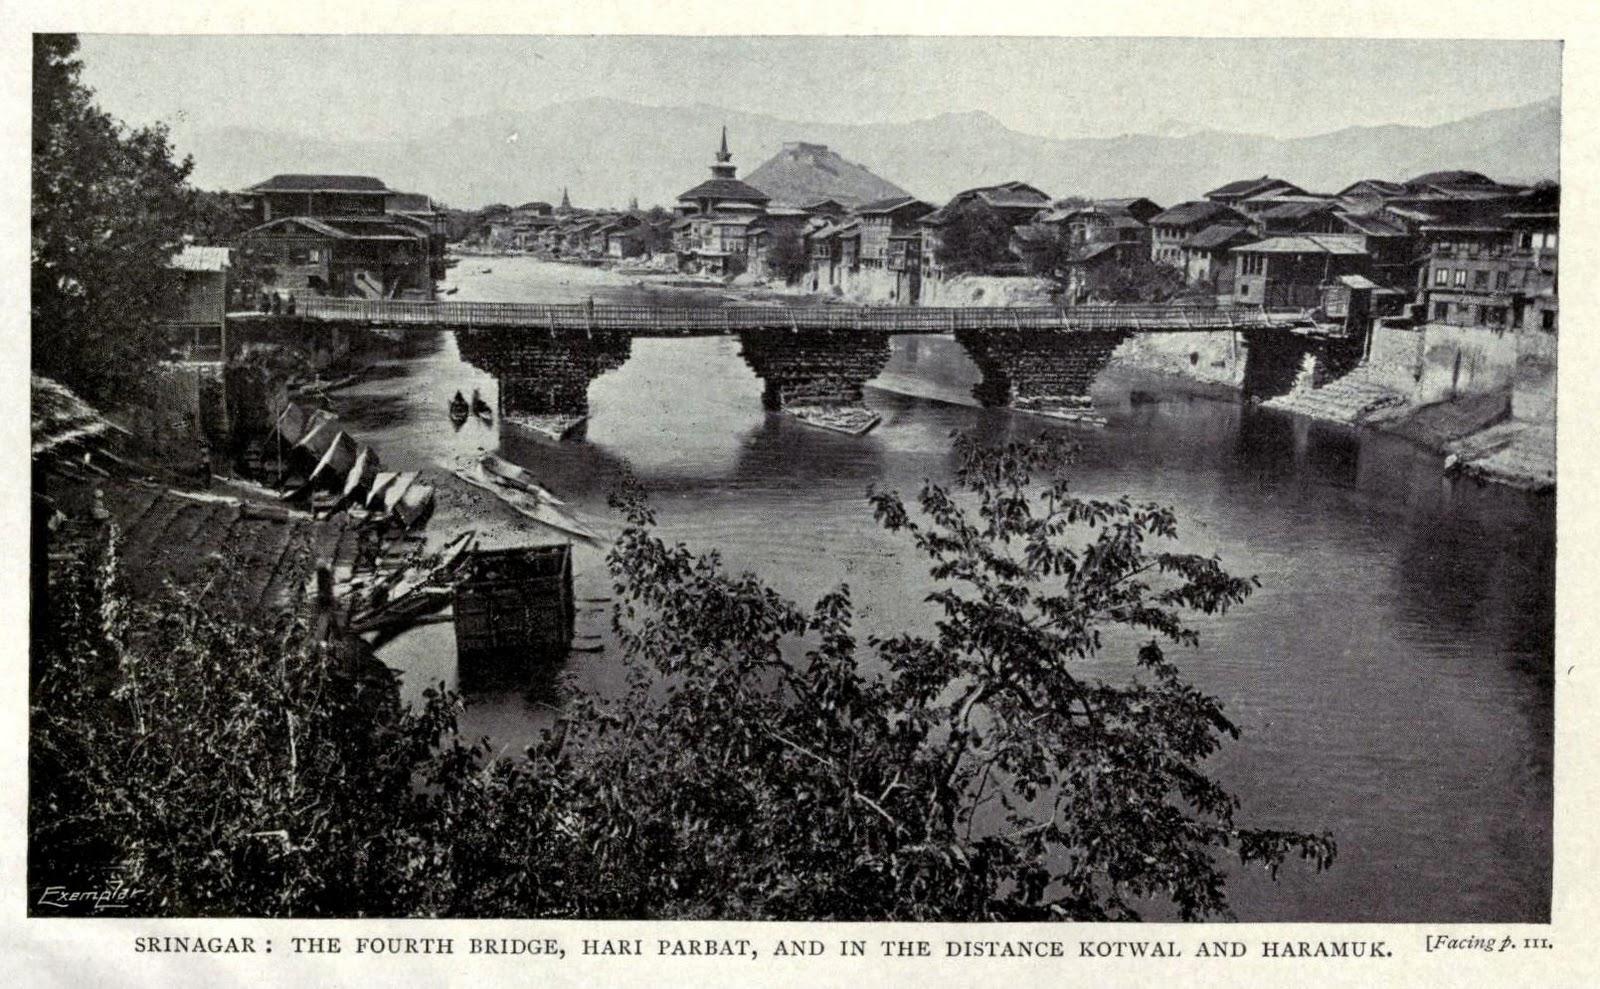 The Fourth bridge, Hari Parbat, and in the distance Kotwal and Haramuk